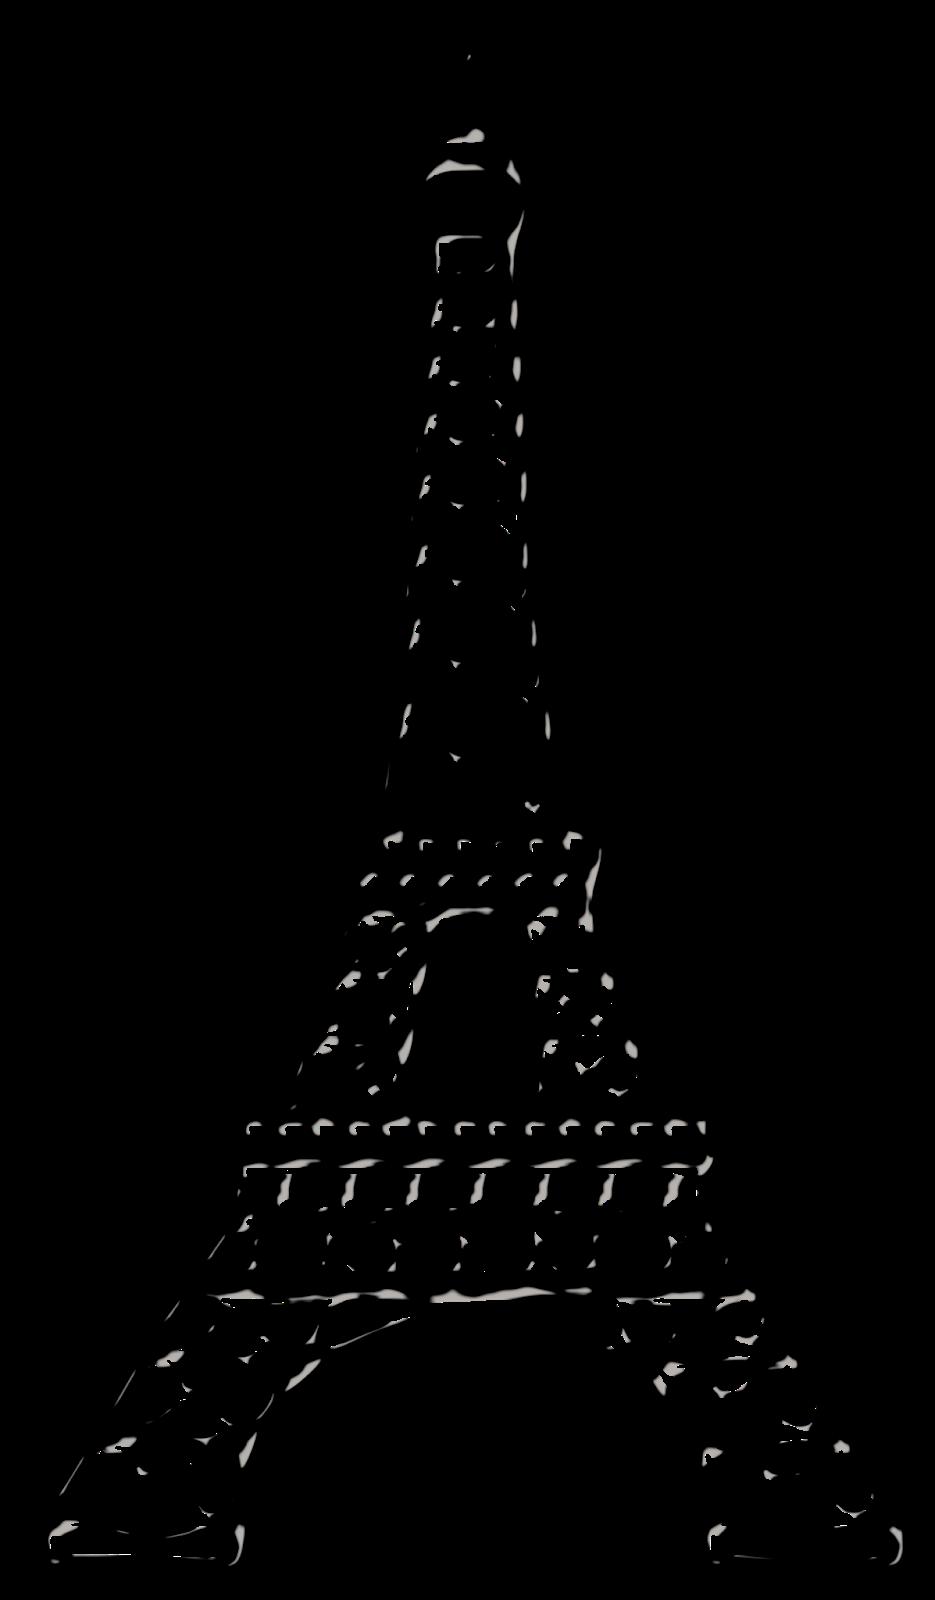 The eiffel tower with arms that flex clipart svg royalty free Bello Clipart Chic Paris. | Paris | Eiffel tower drawing ... svg royalty free